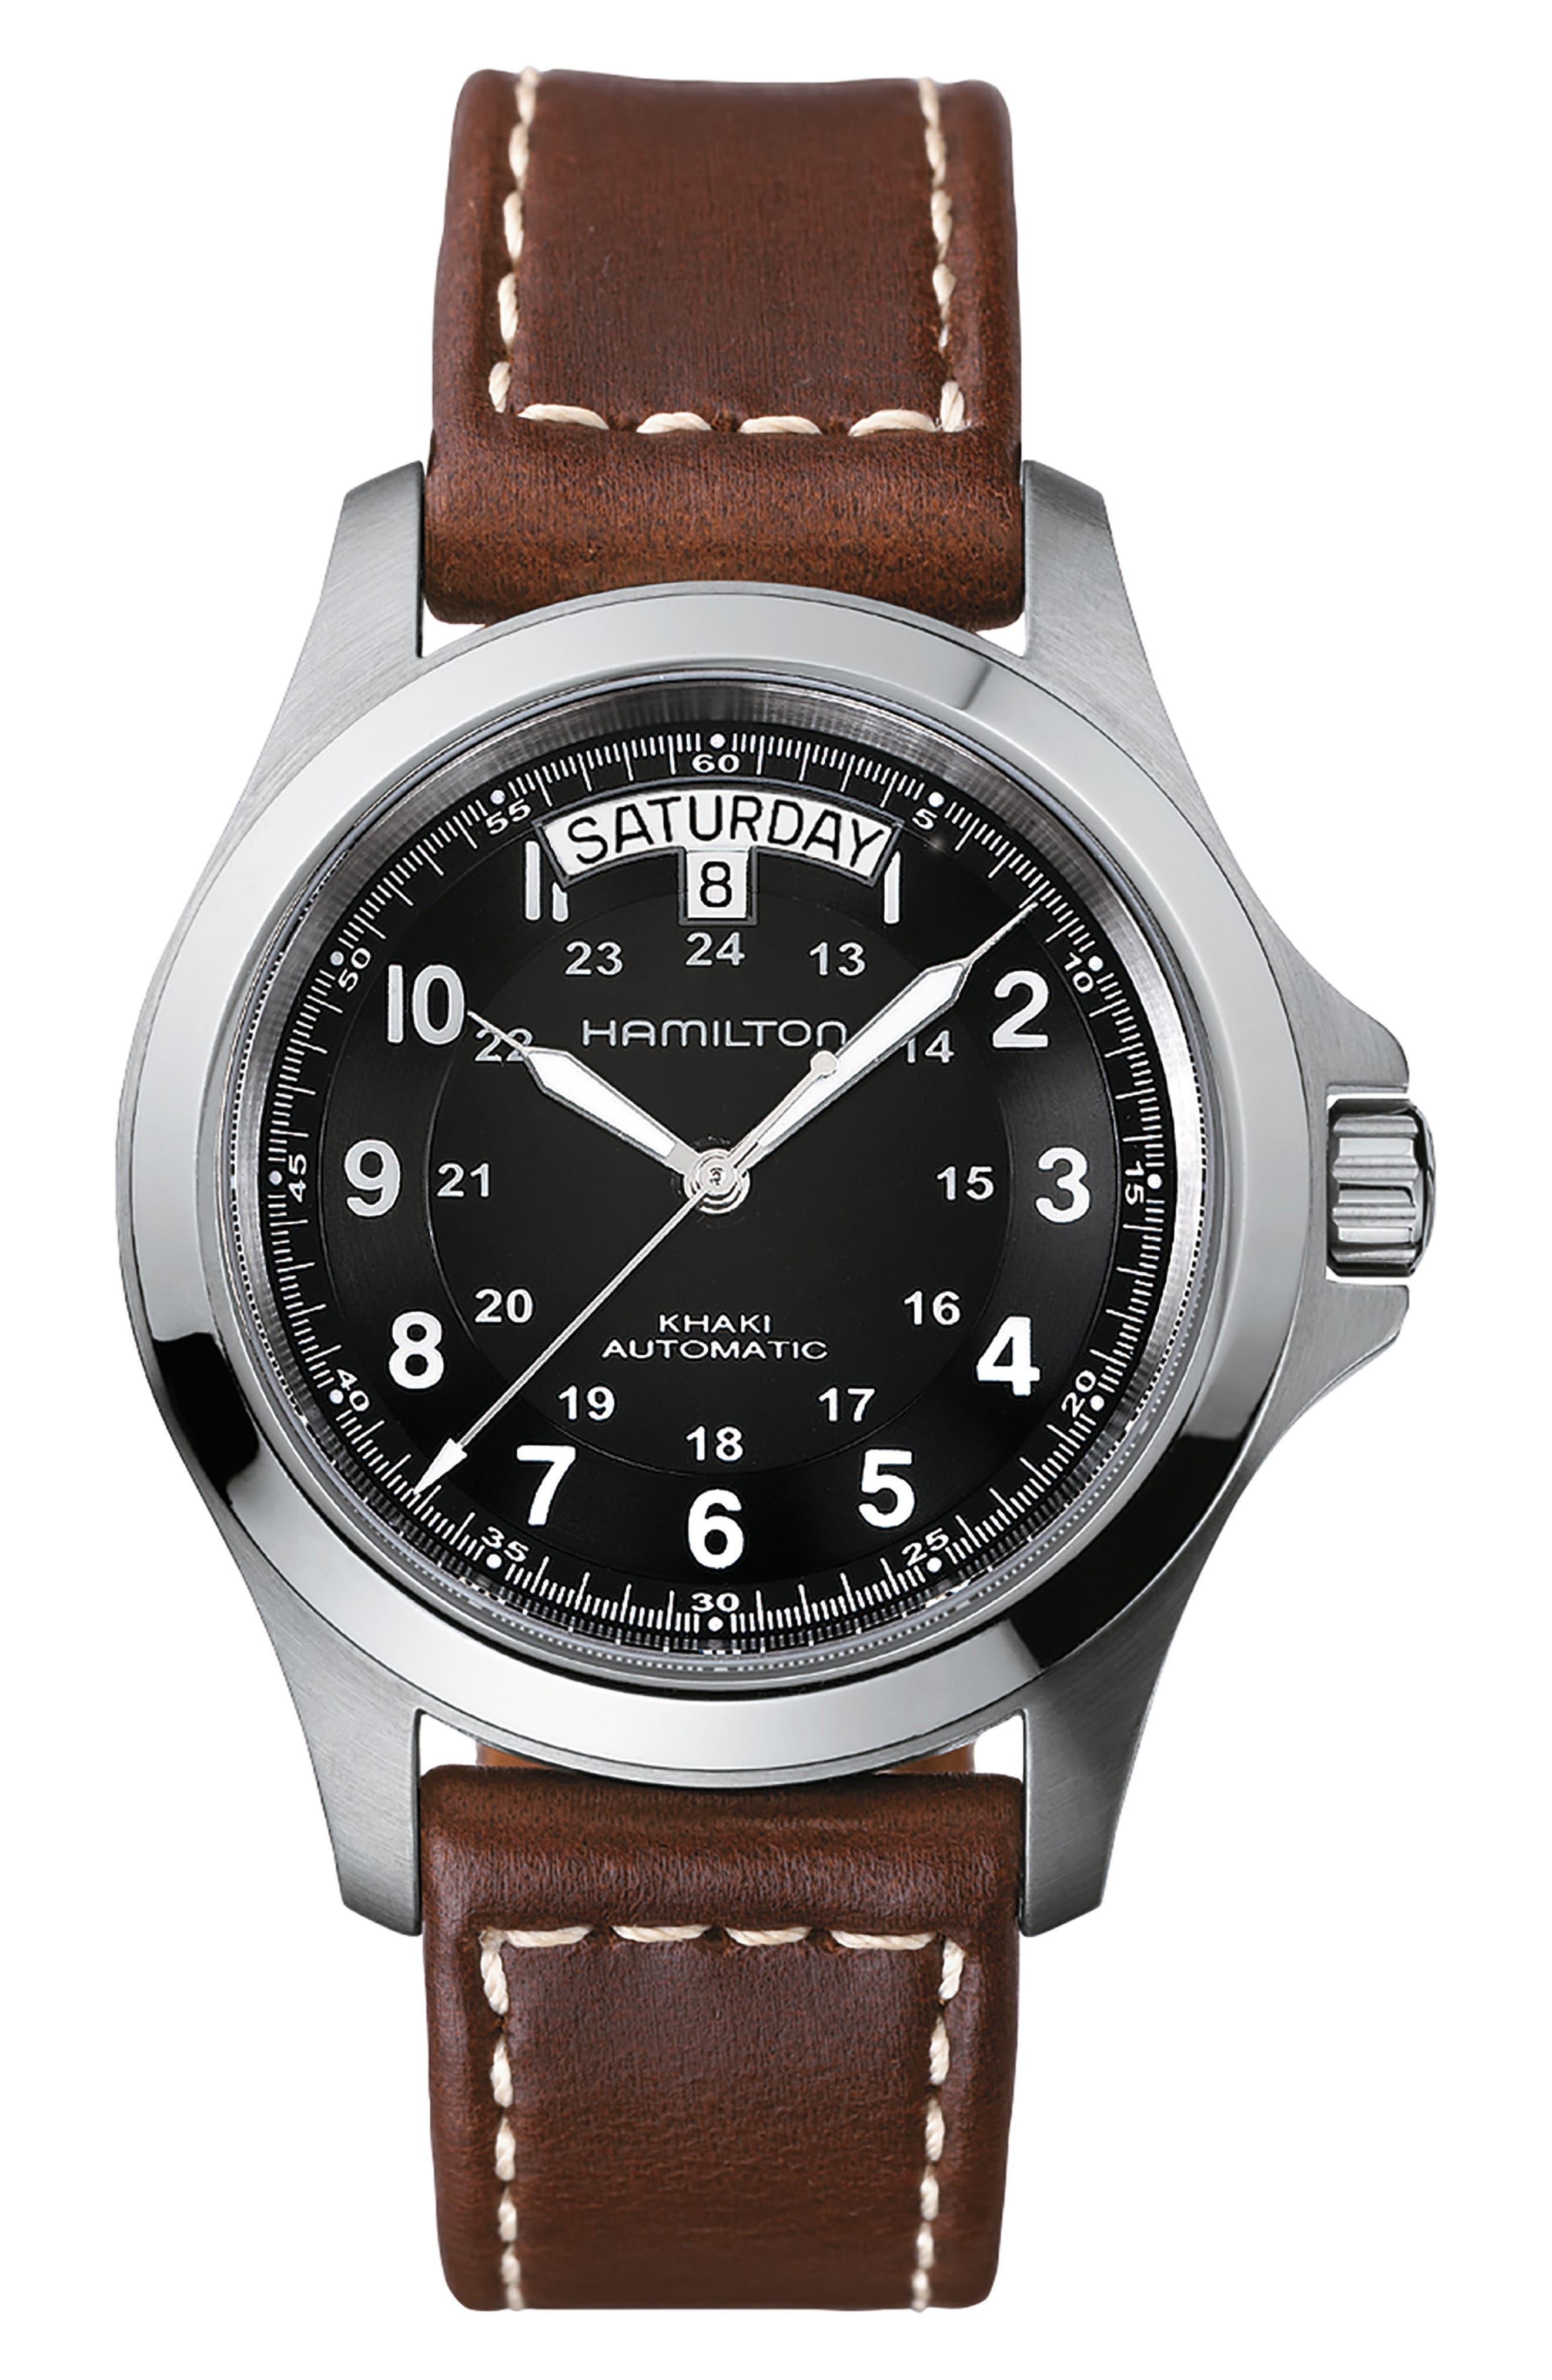 HAMILTON Khaki King Automatic Leather Strap Watch, 40mm, Main, color, BROWN/ BLACK/ SILVER